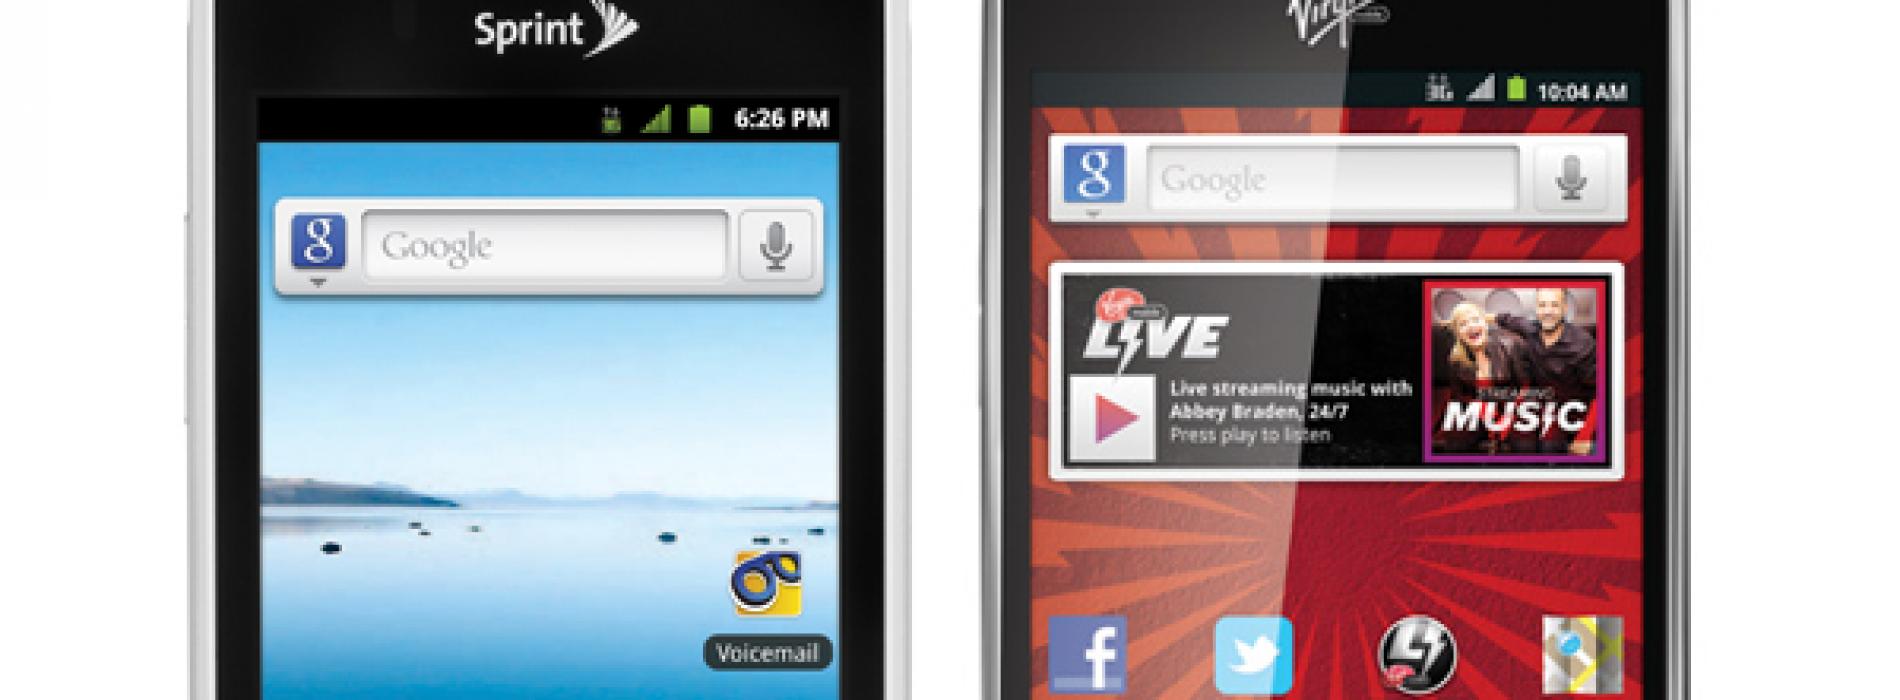 LG Optimus Elite leaks with Sprint, Virgin Mobilebranding